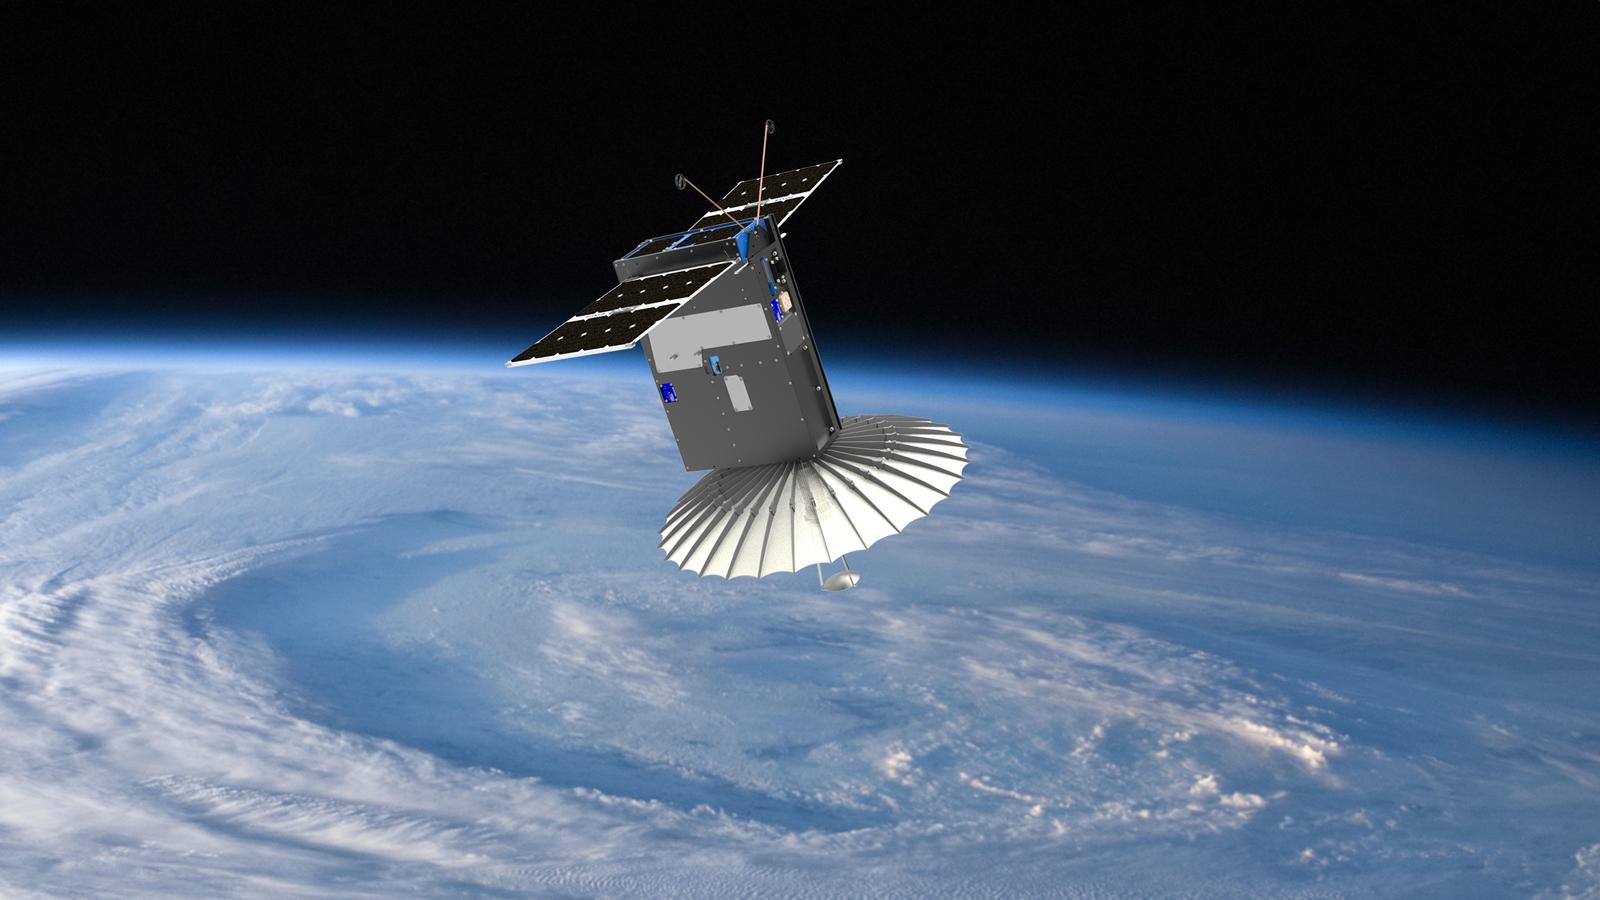 Tiny 'Black Magic' Satellite Packs Origami-Like Radar Dish